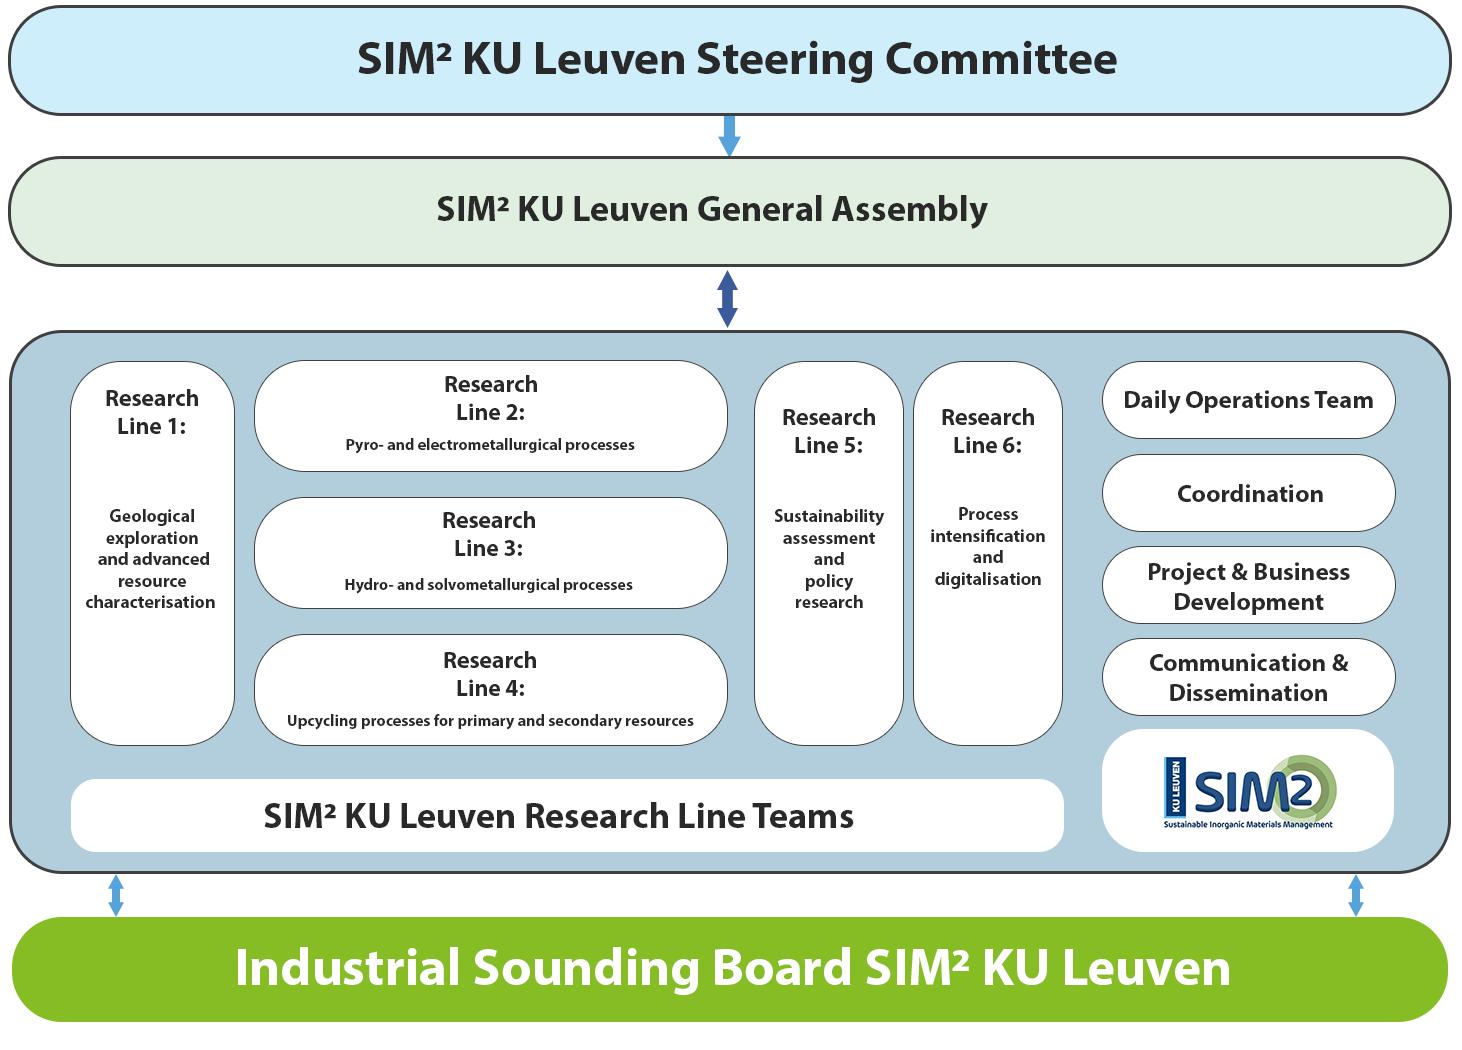 Governance Scheme SIM² KU Leuven